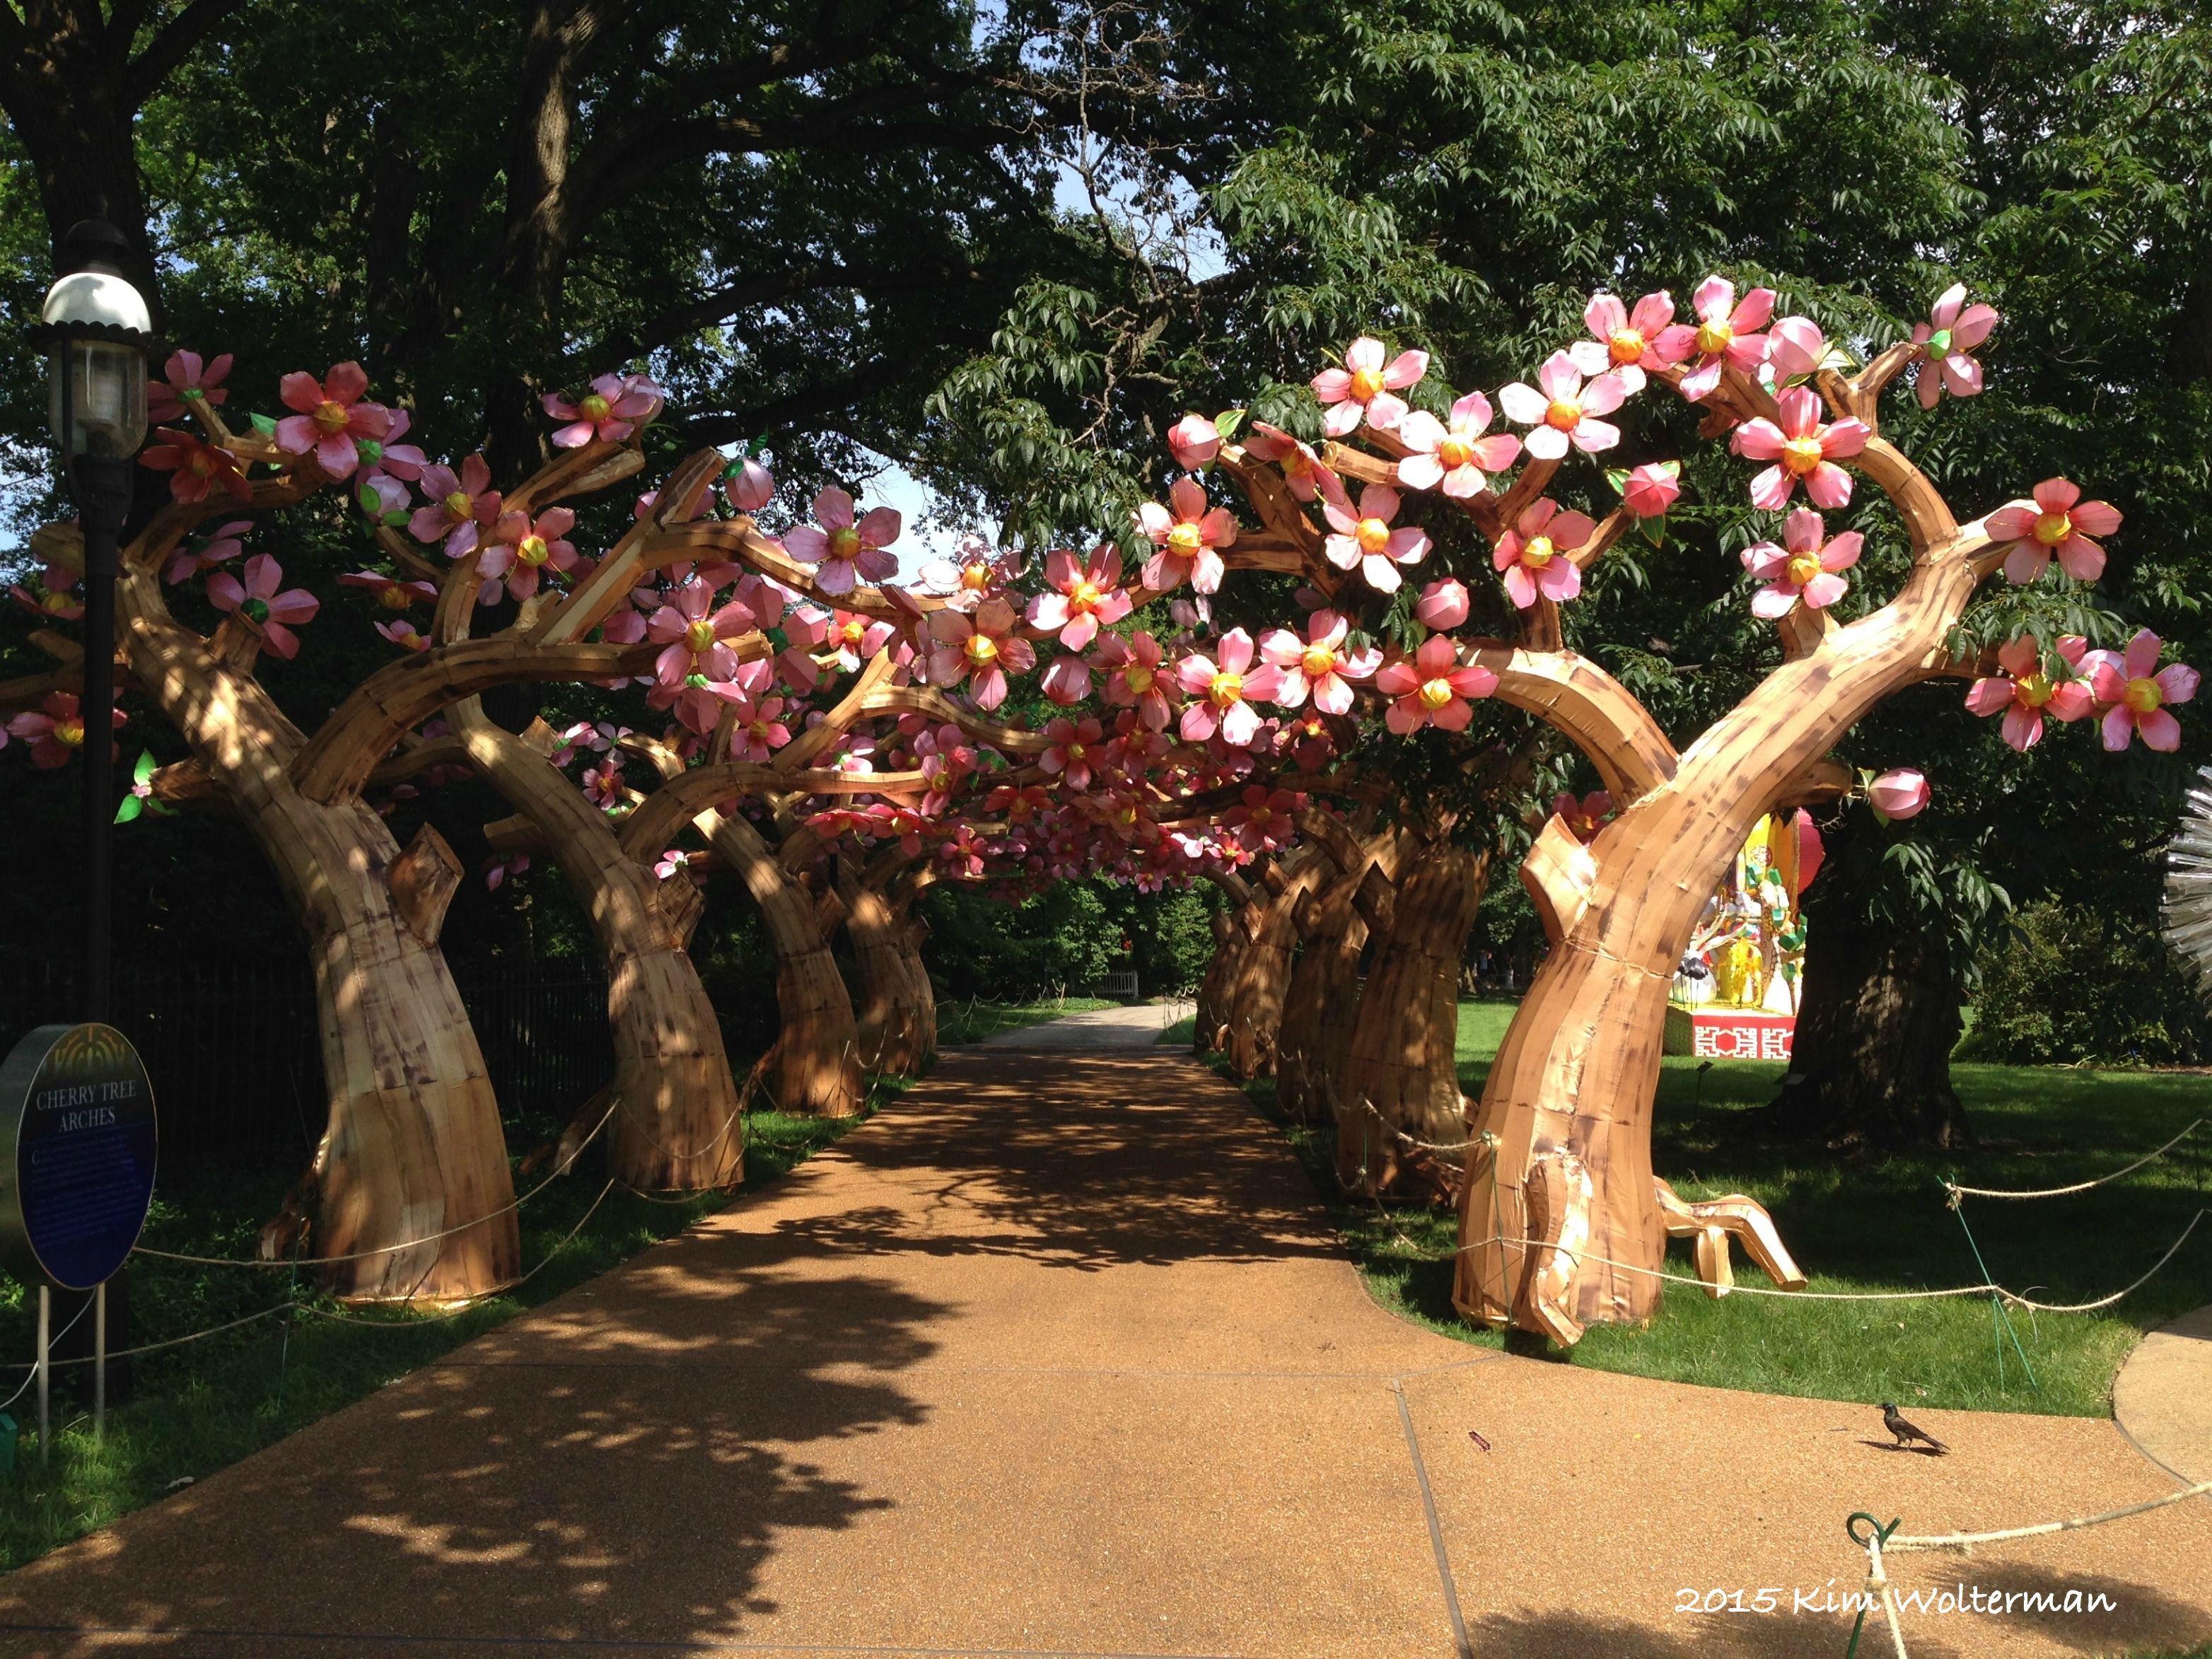 Cherry Tree Arches lantern at the Missouri Botanical Garden Lantern ...